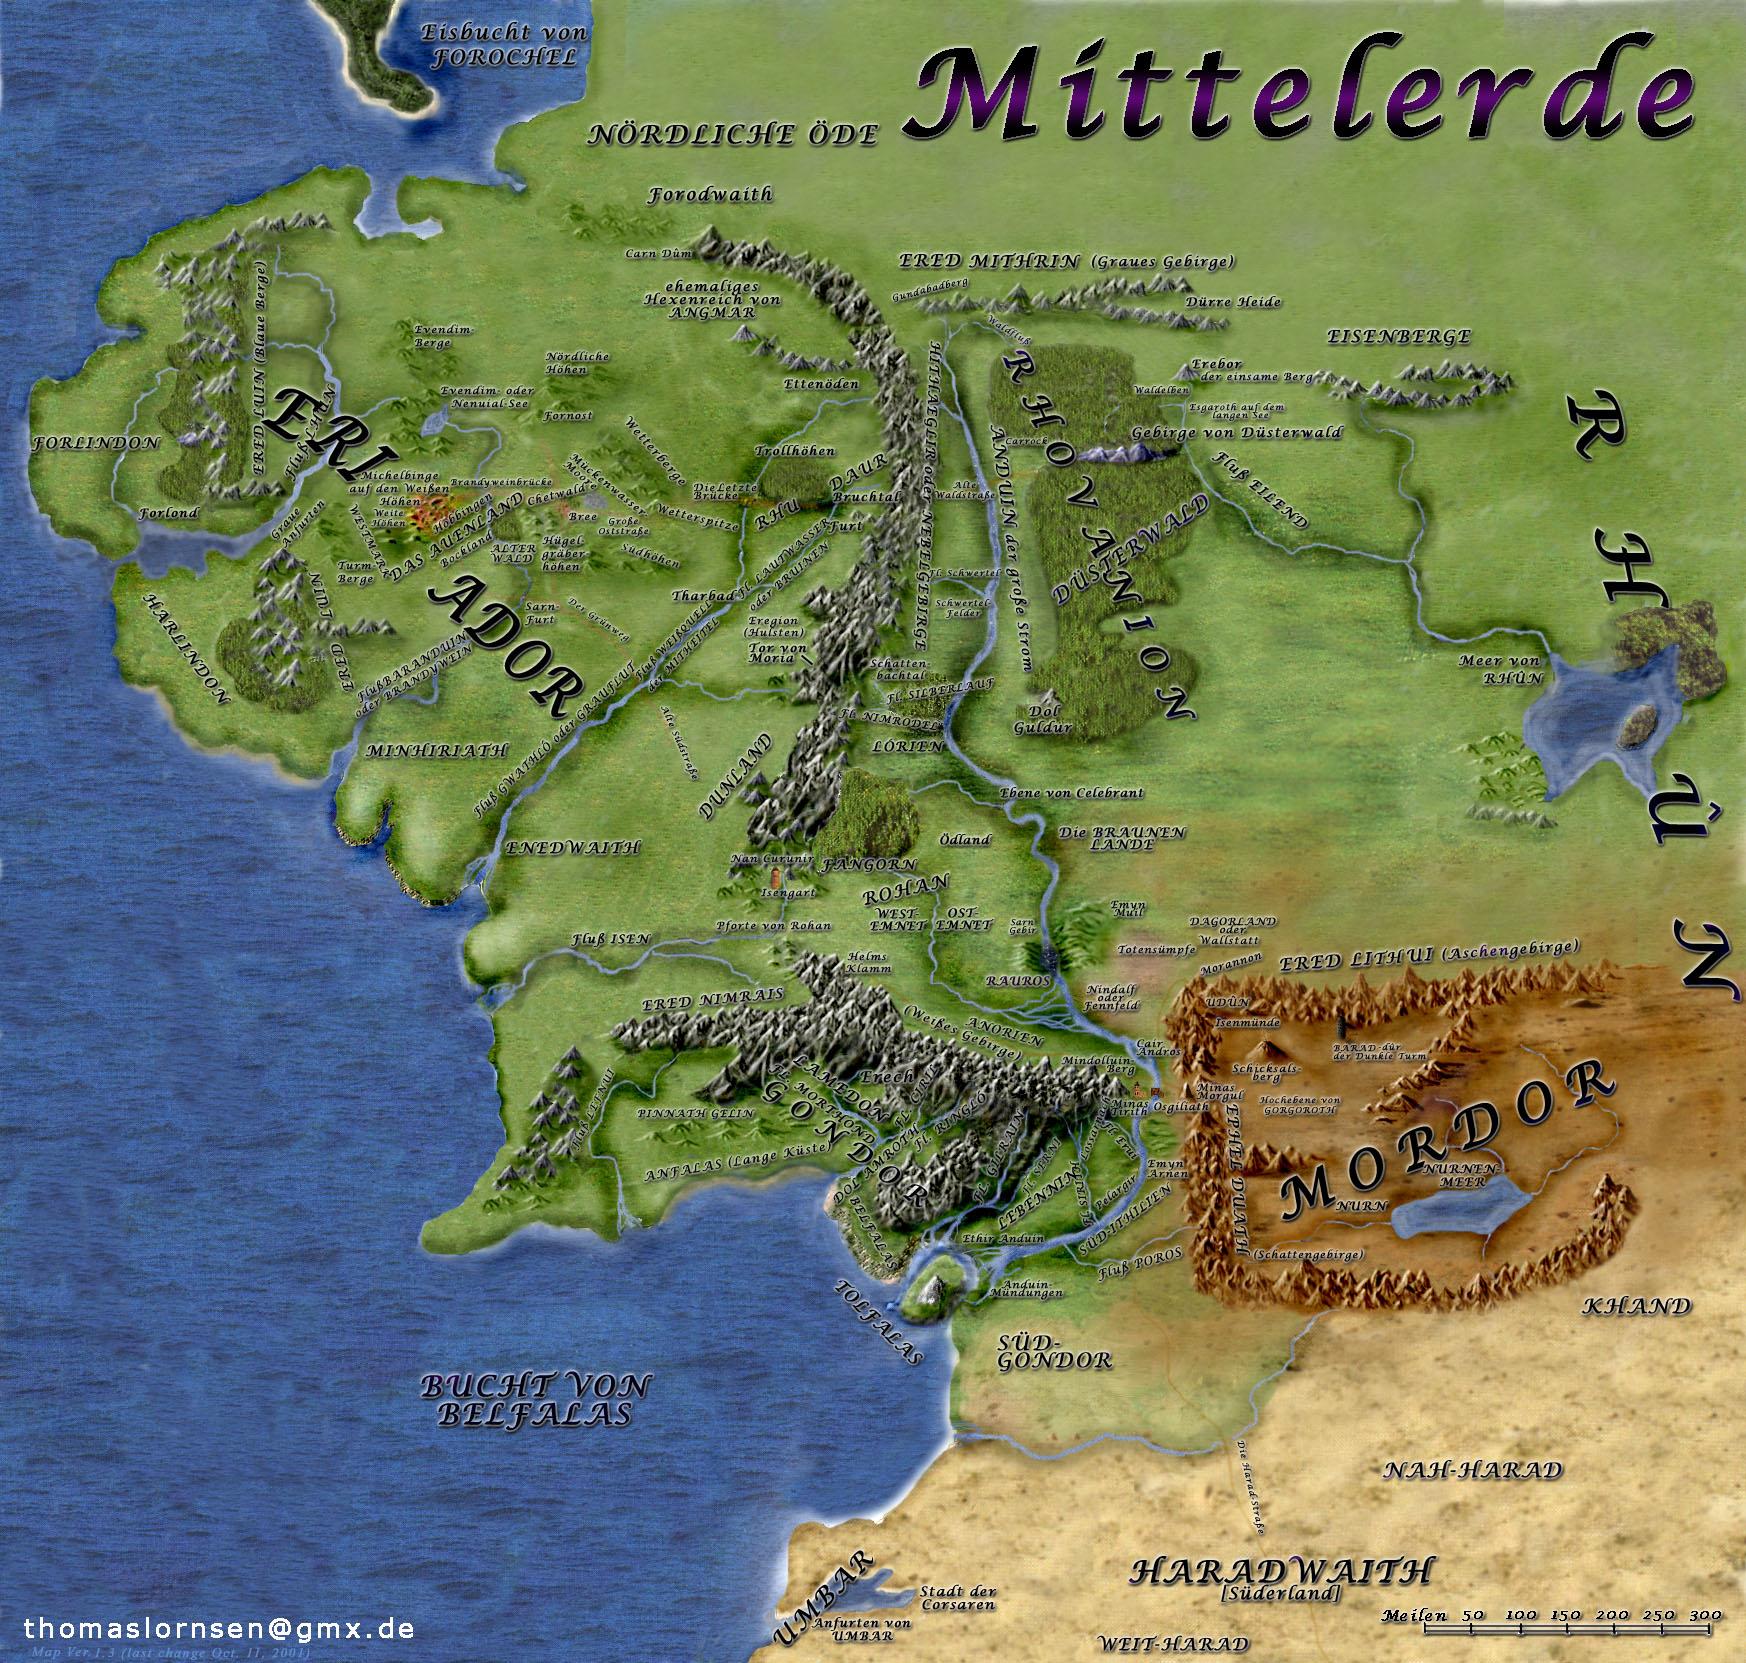 middleearth-ger.jpg